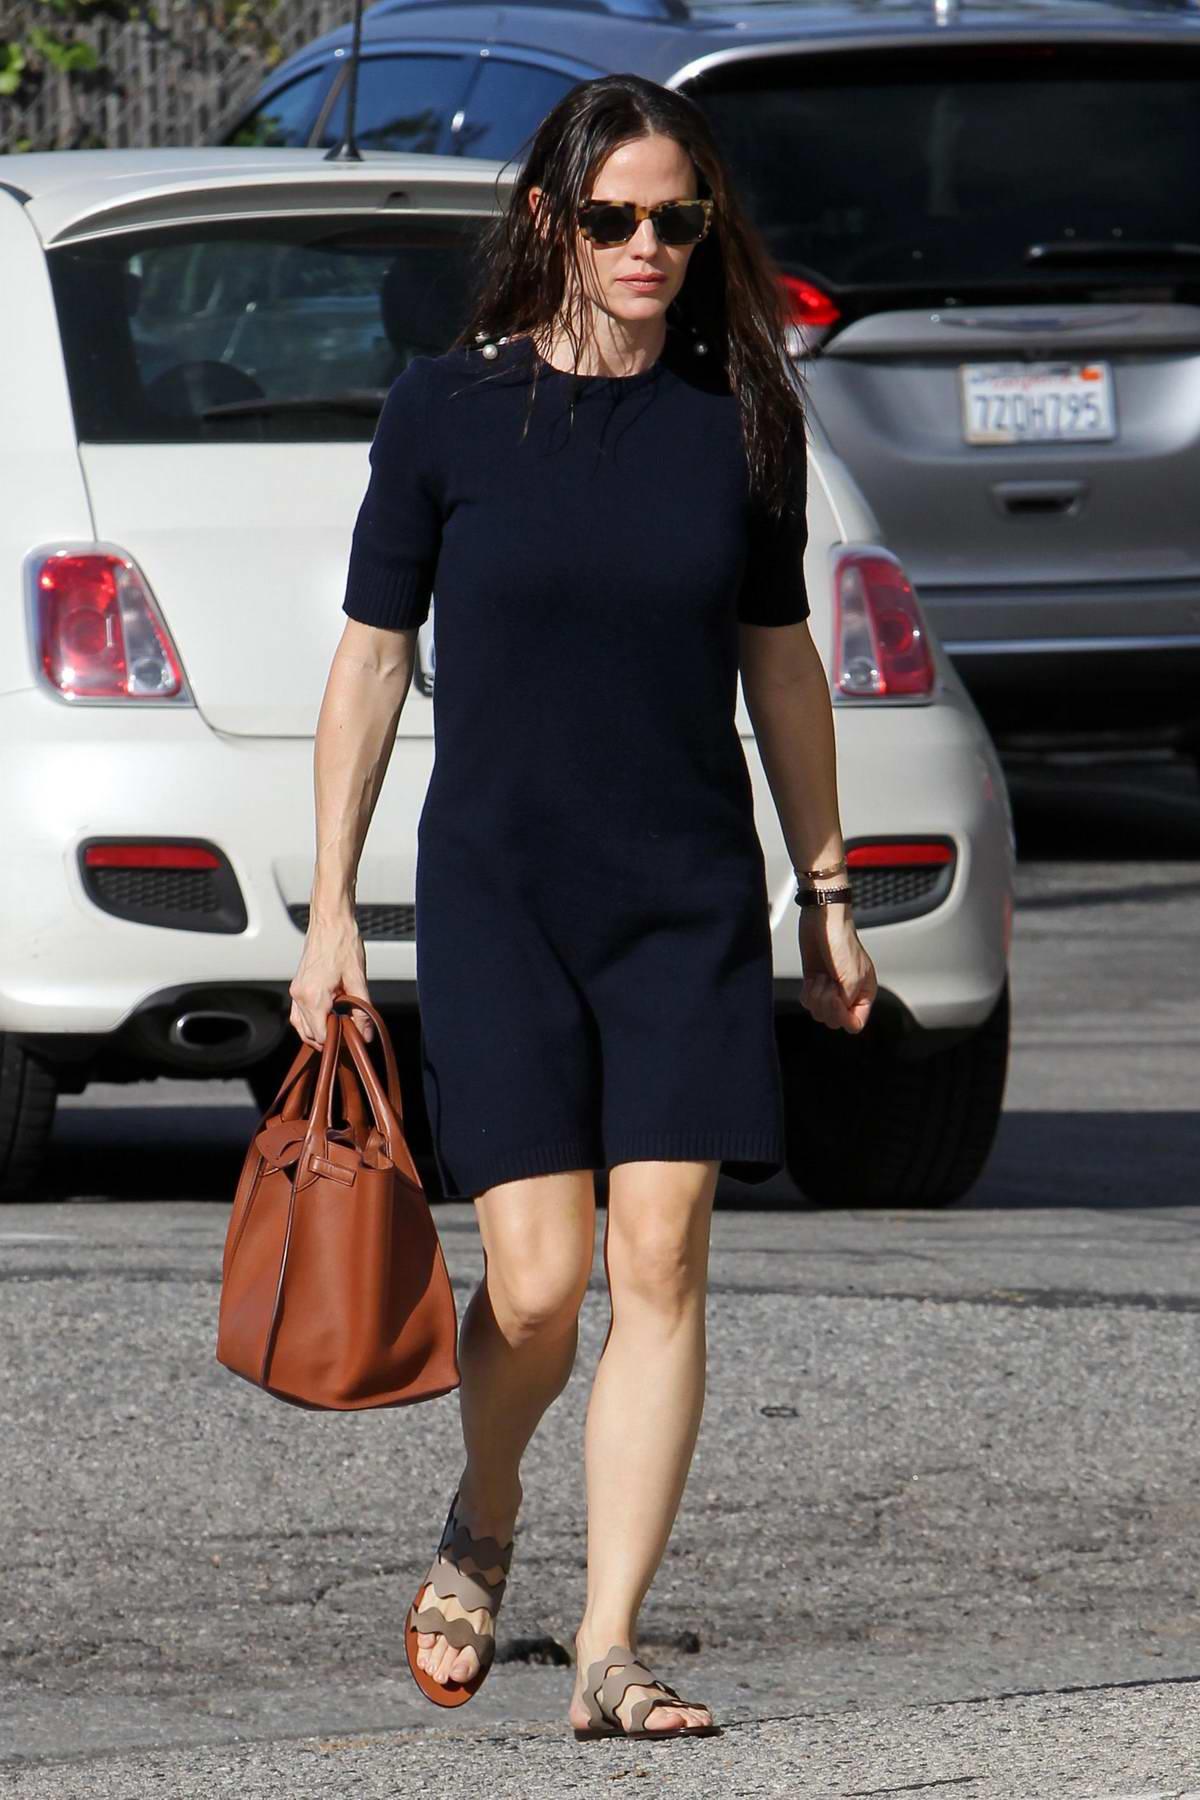 Jennifer Garner wears a navy blue dress to Church for Sunday service in Los Angeles